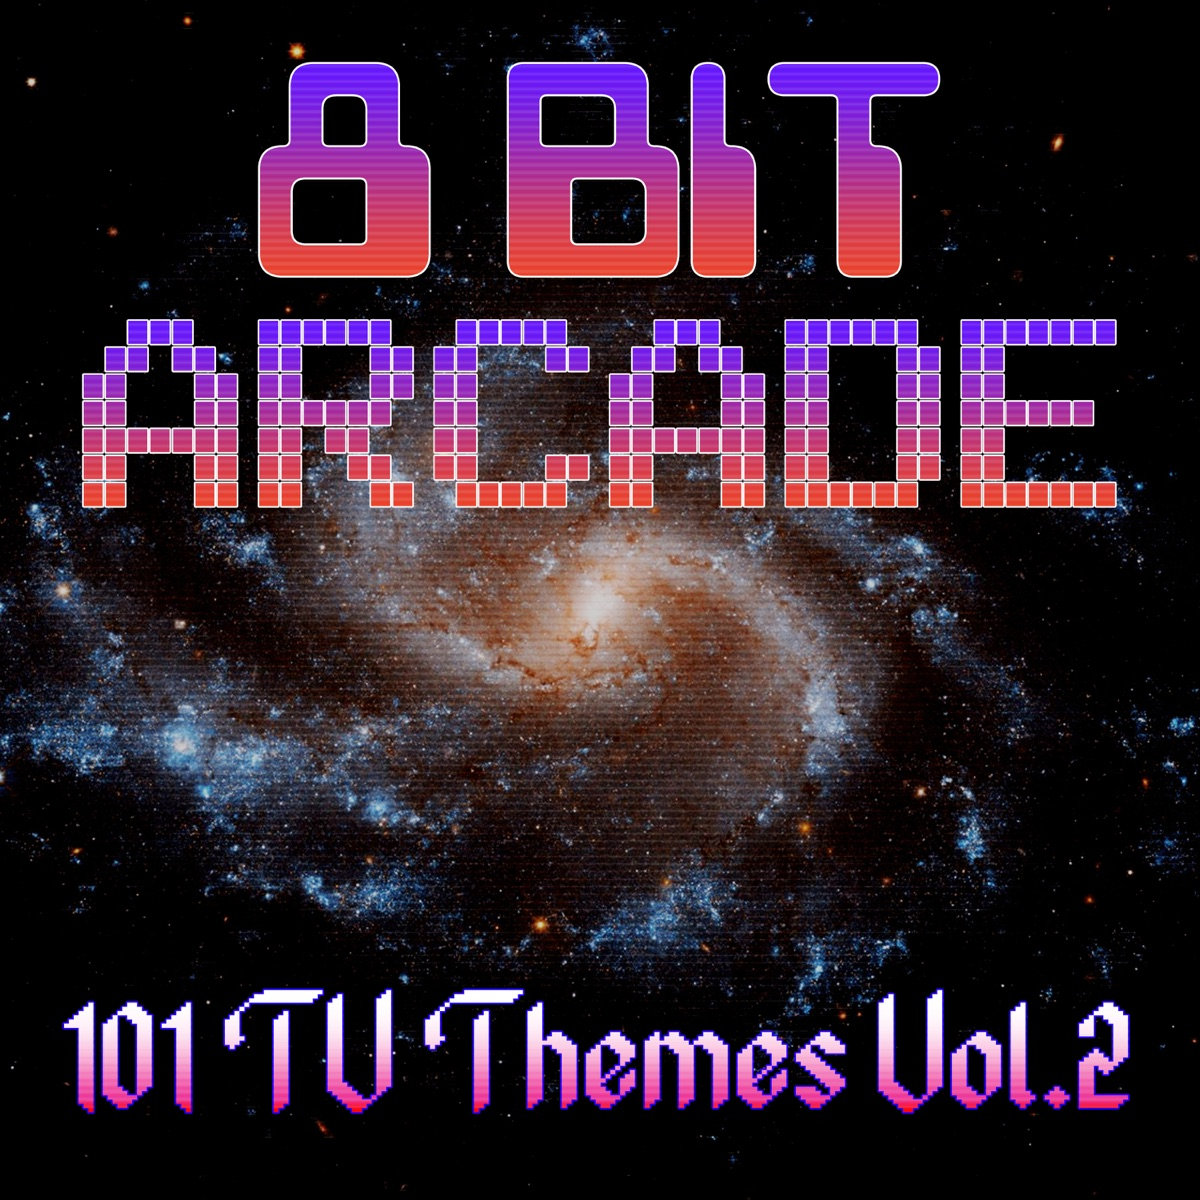 101 Television Themes Vol 2 8-Bit Arcade CD cover